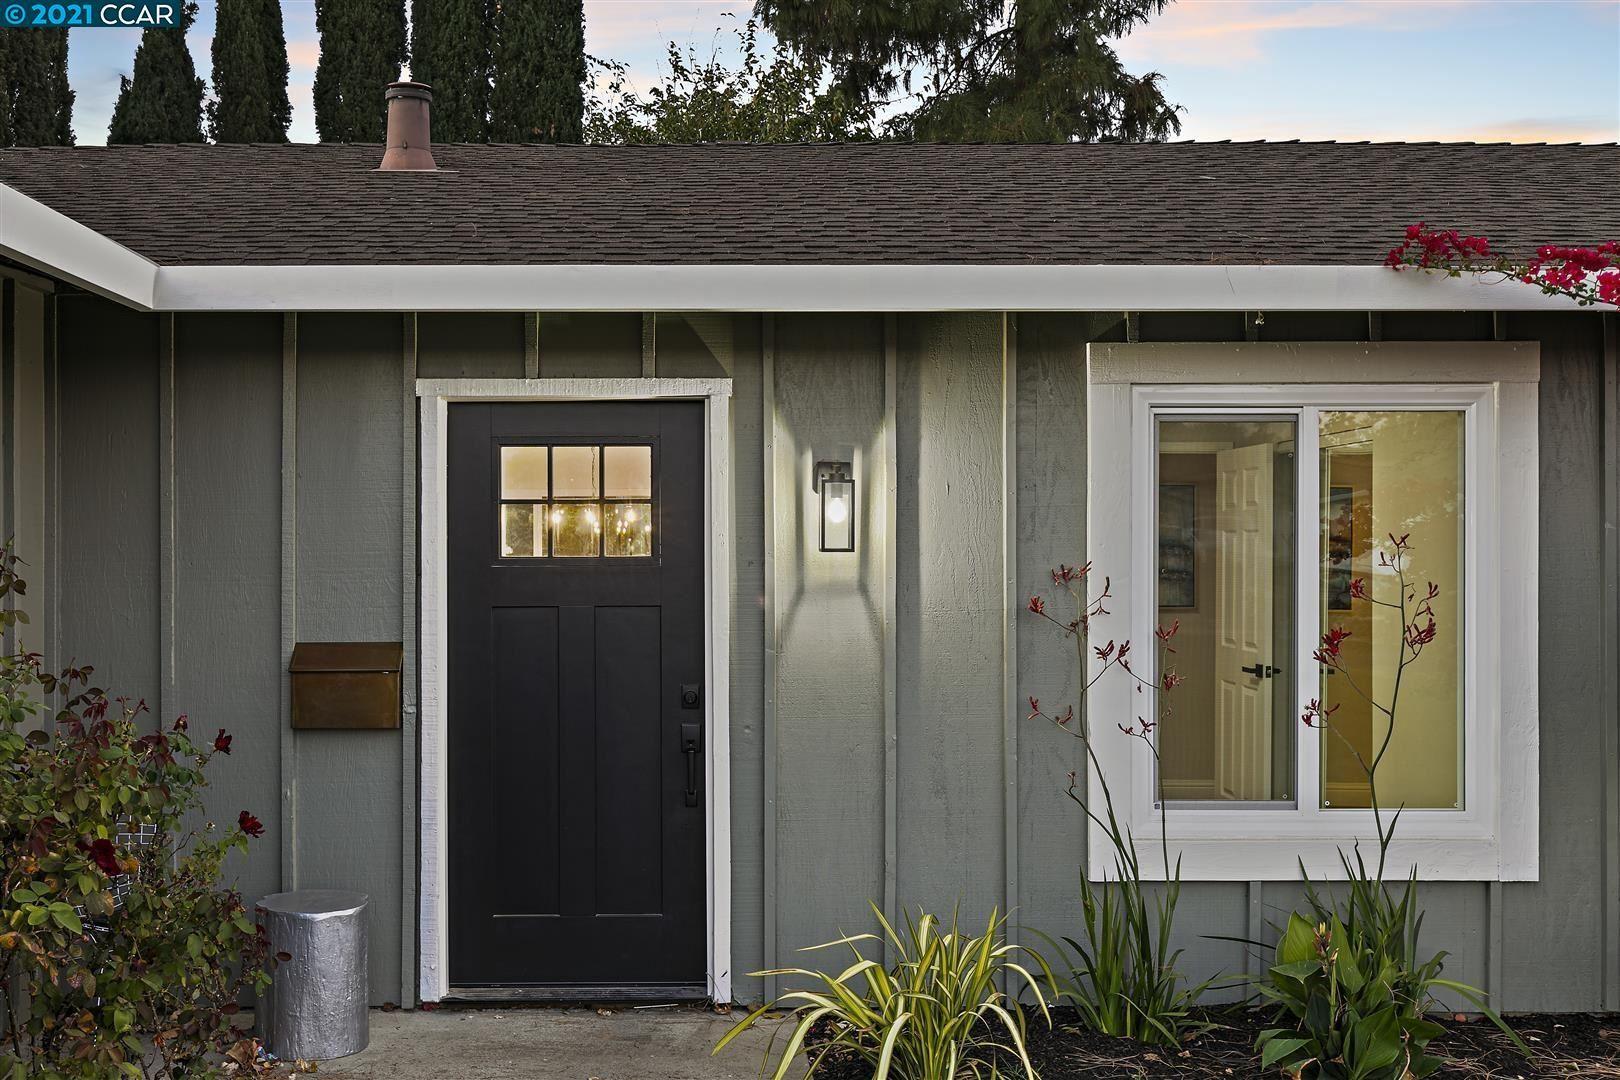 Photo of 2200 Jefferson Way, Antioch, CA 94509 (MLS # 40971256)